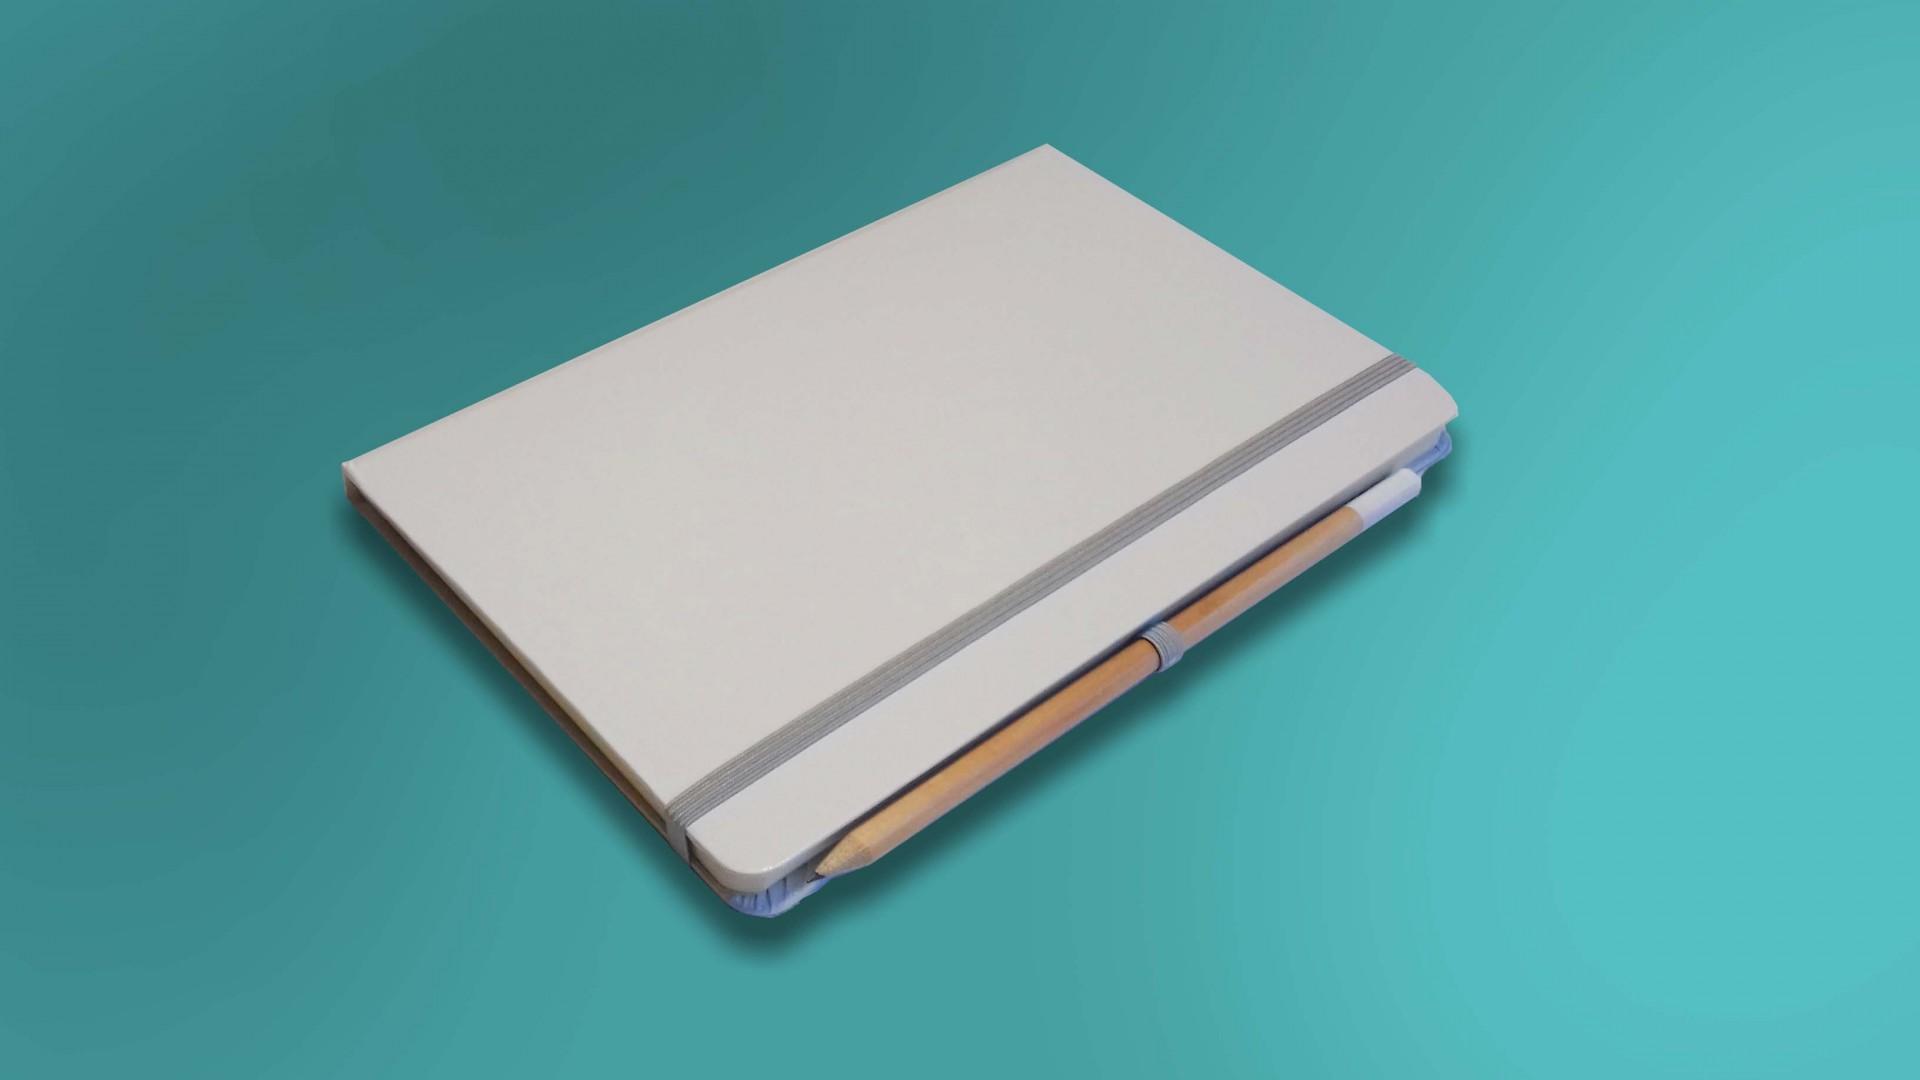 Caderno Branco com Fita Cinzenta